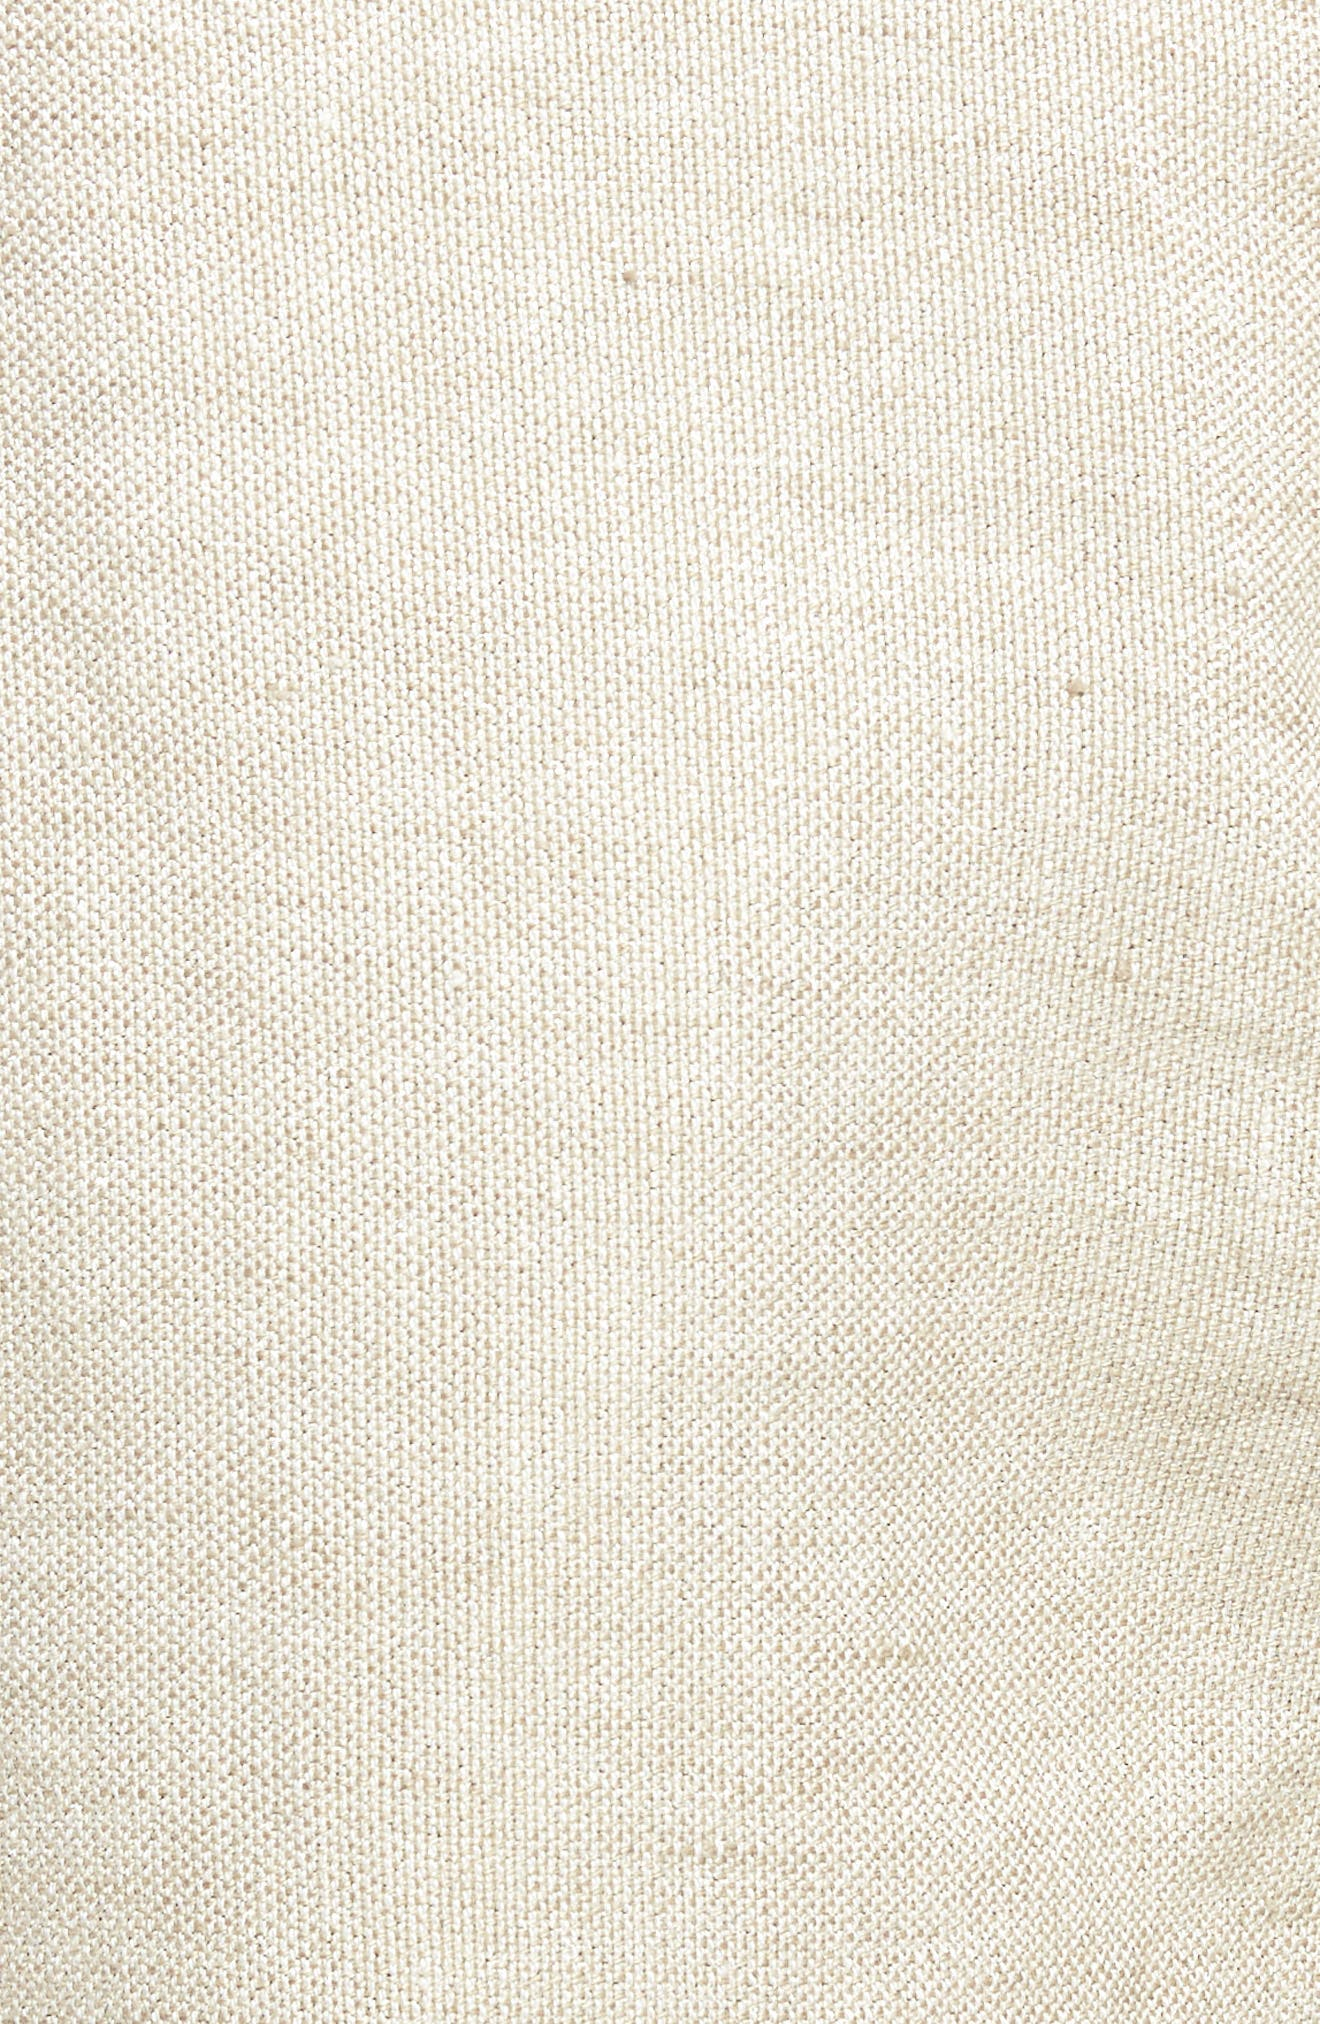 Organic Linen Blend Walking Shorts,                             Alternate thumbnail 4, color,                             Natural